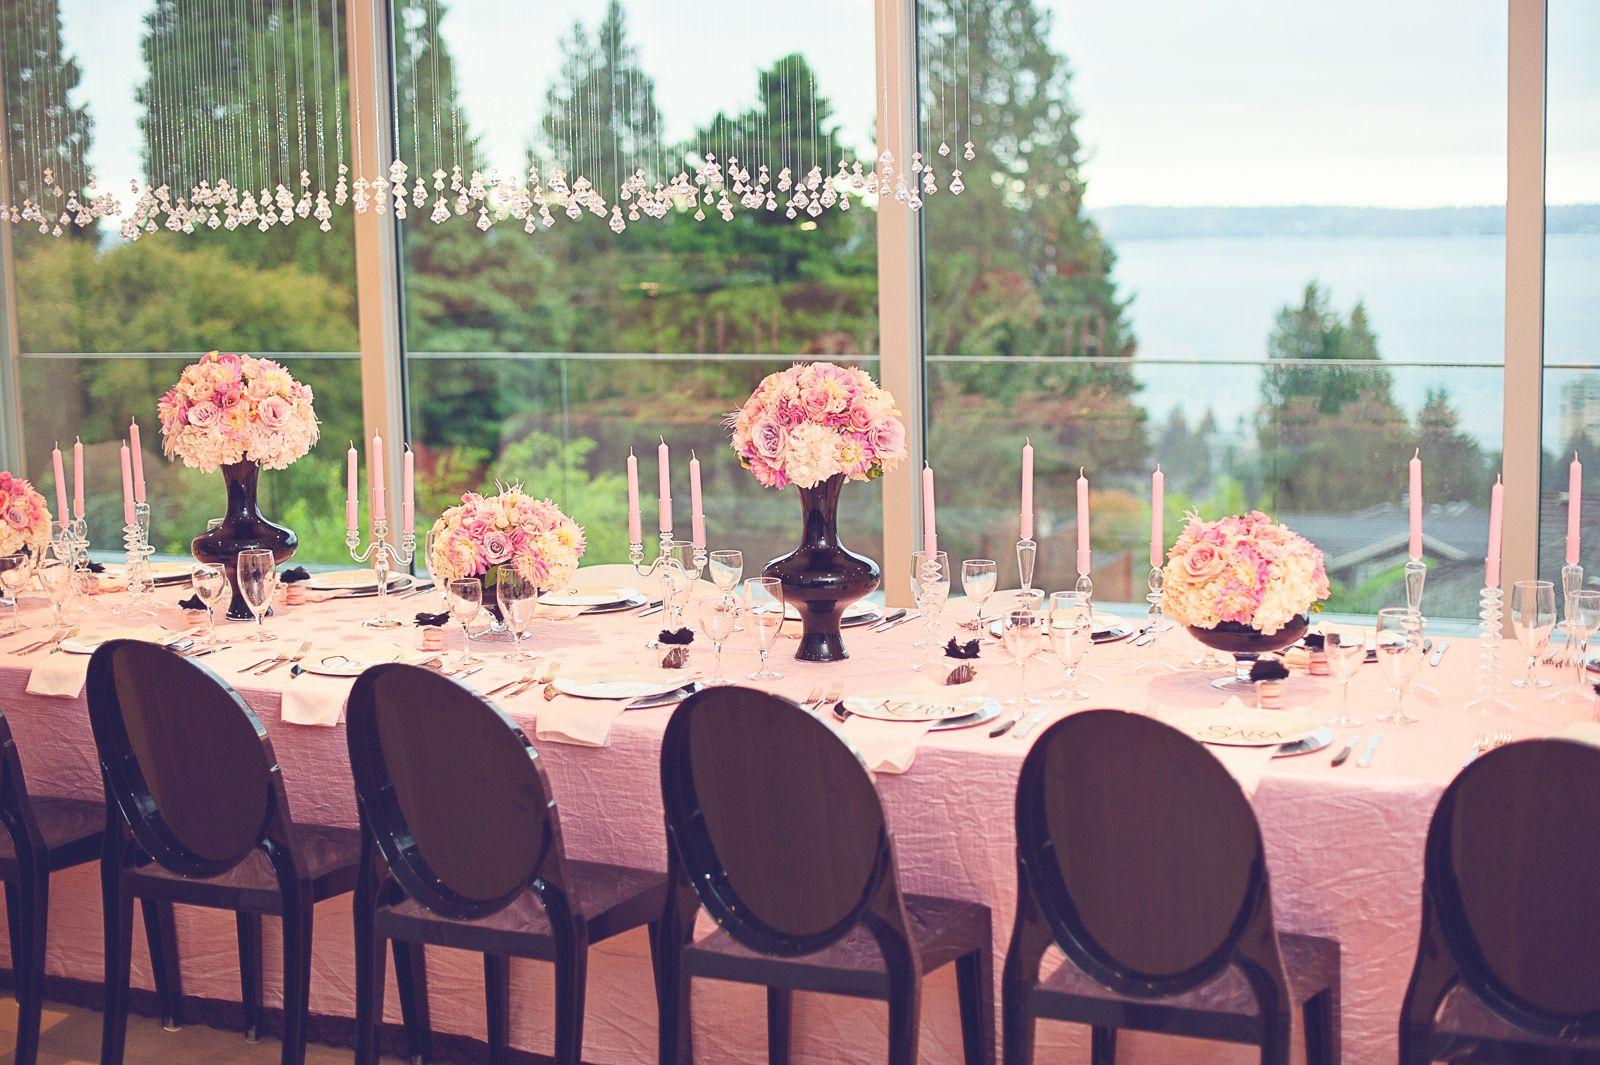 Chanel wedding diy crystal chandeliers pink and black reception